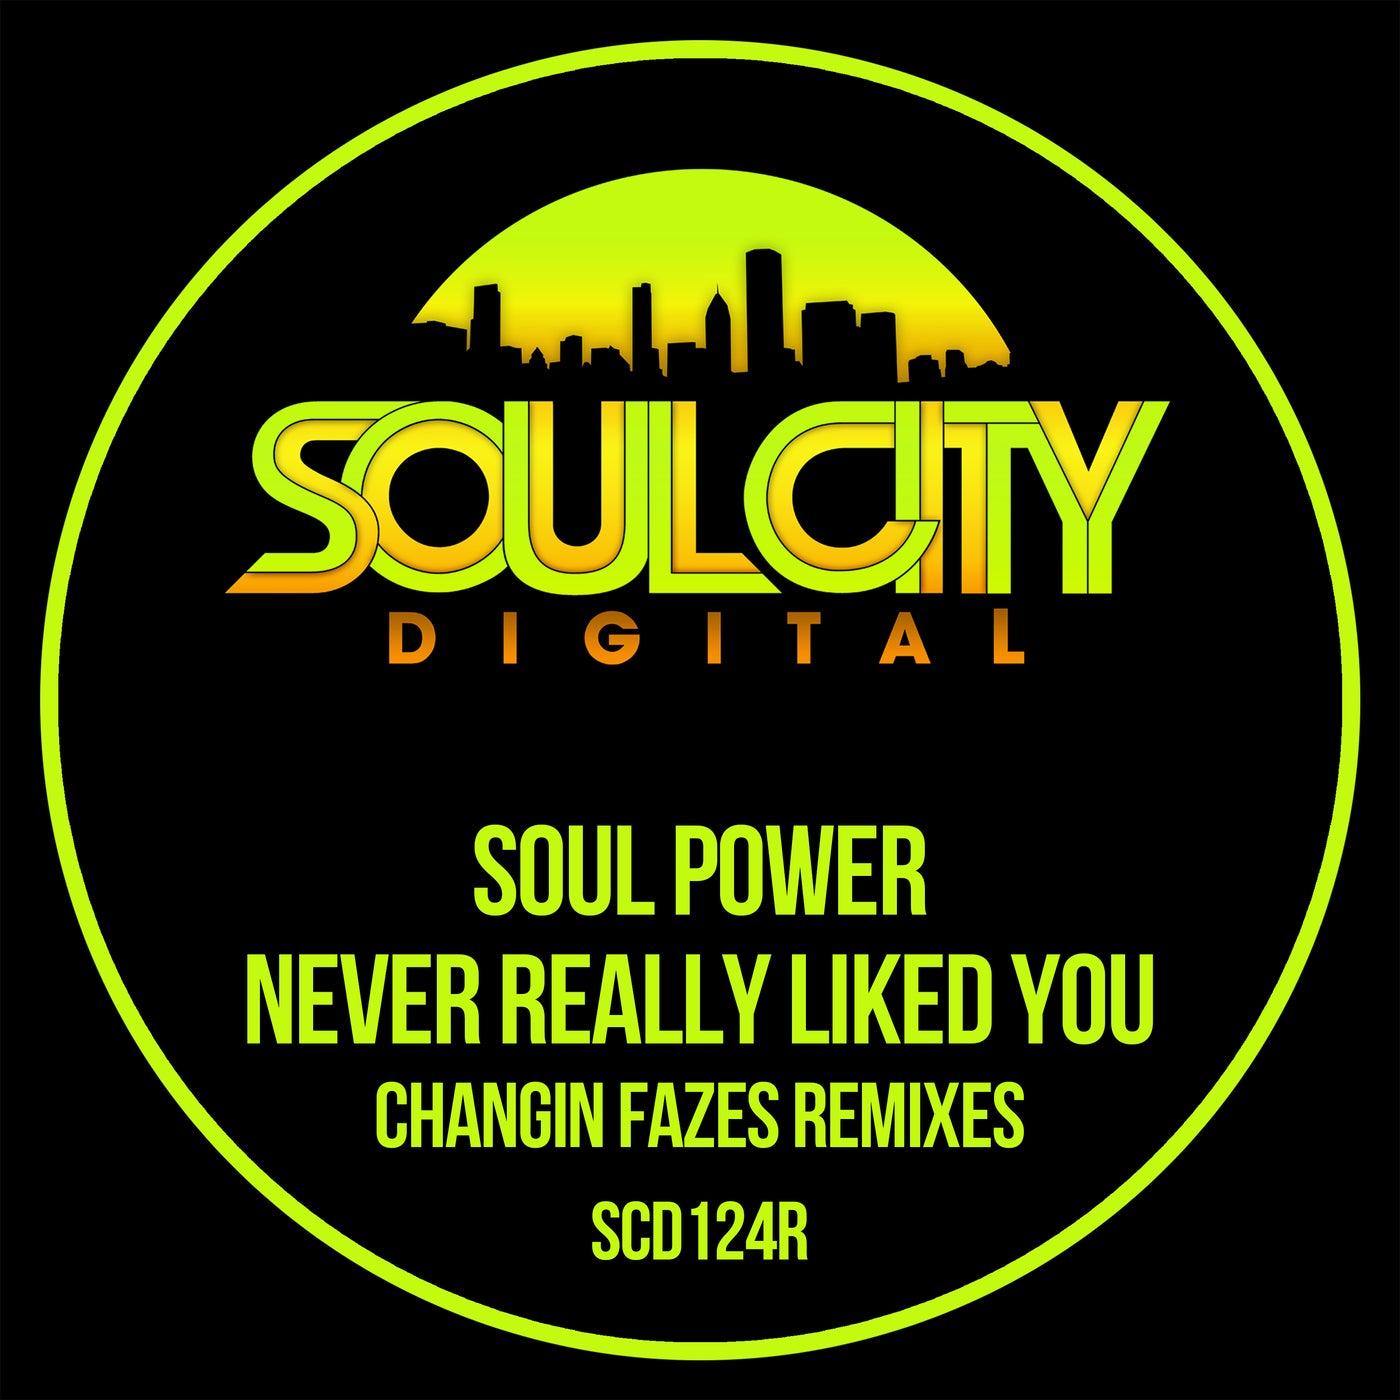 Never Really Liked You (Changin Fazes UK Garage Remix)